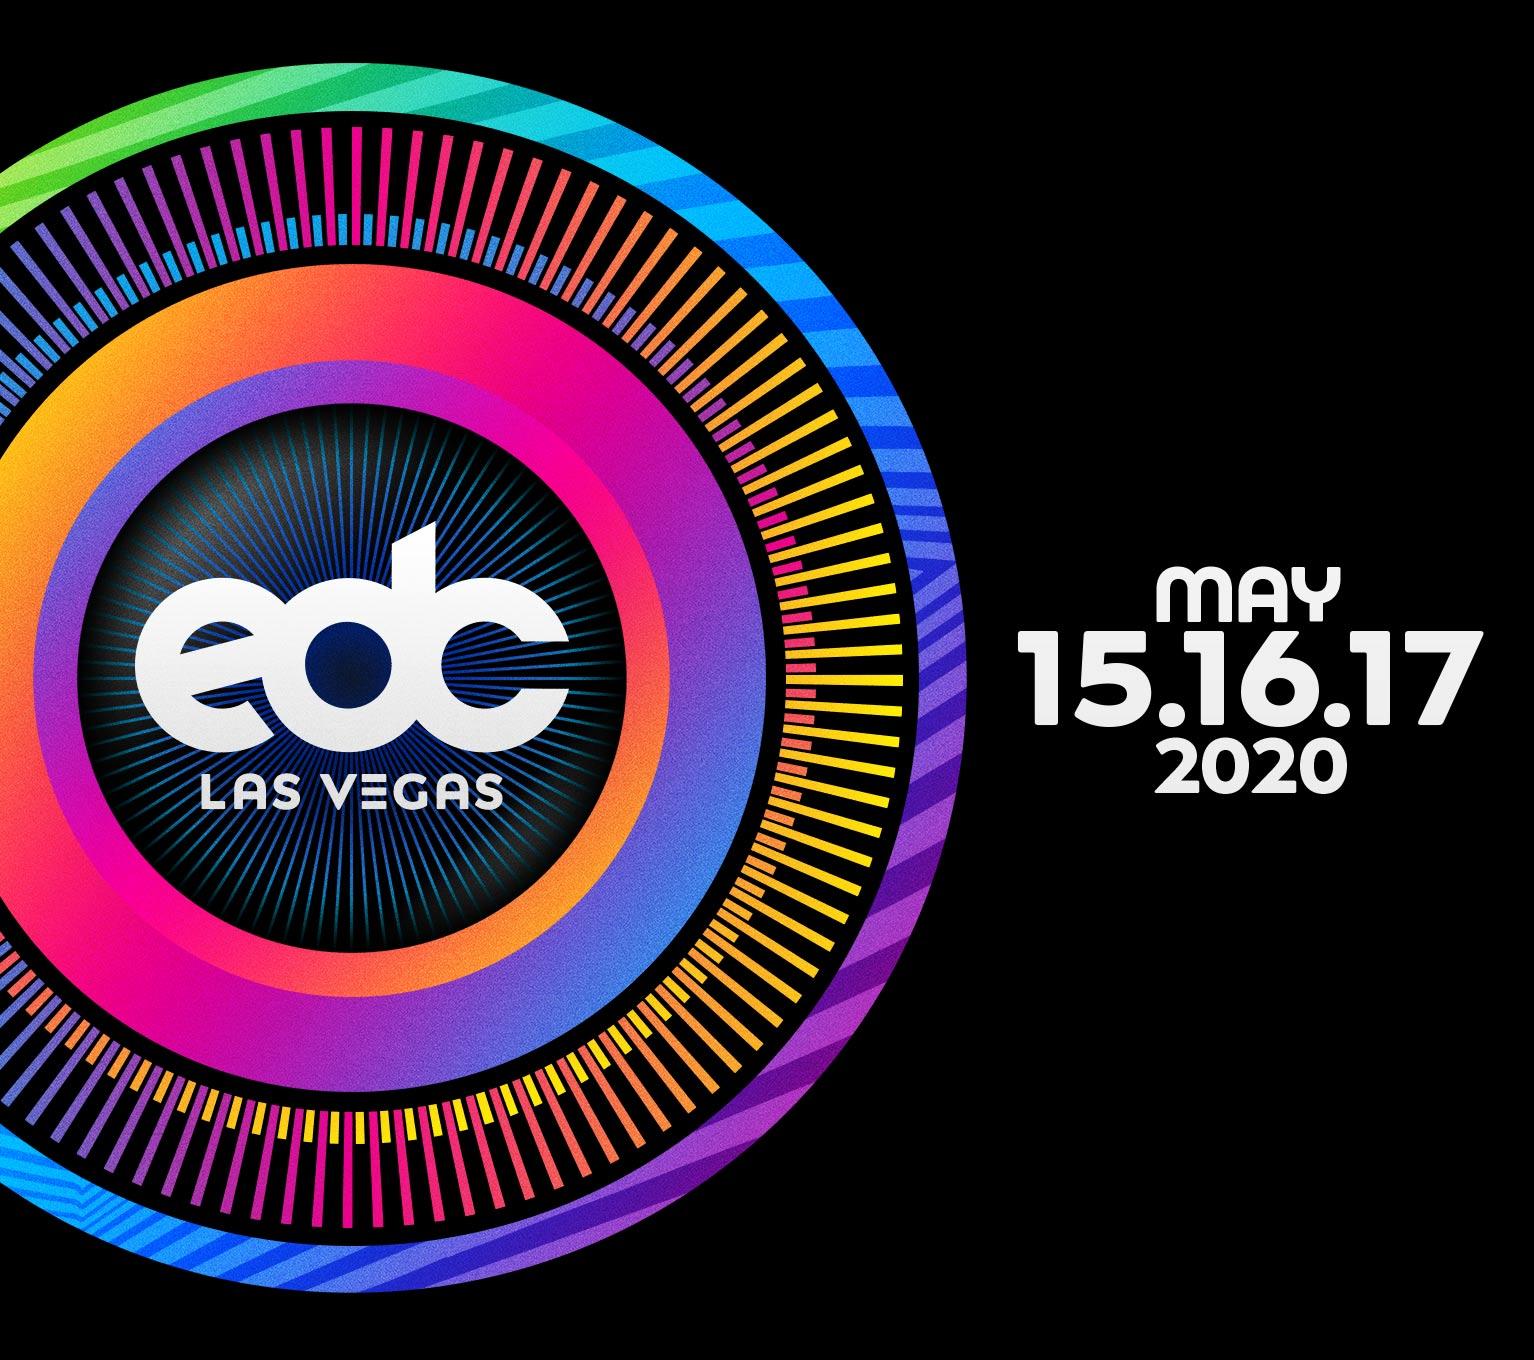 Lantern Festival Nevada 2020 EDC Las Vegas | May 15–17, 2020 | Las Vegas Motor Speedway